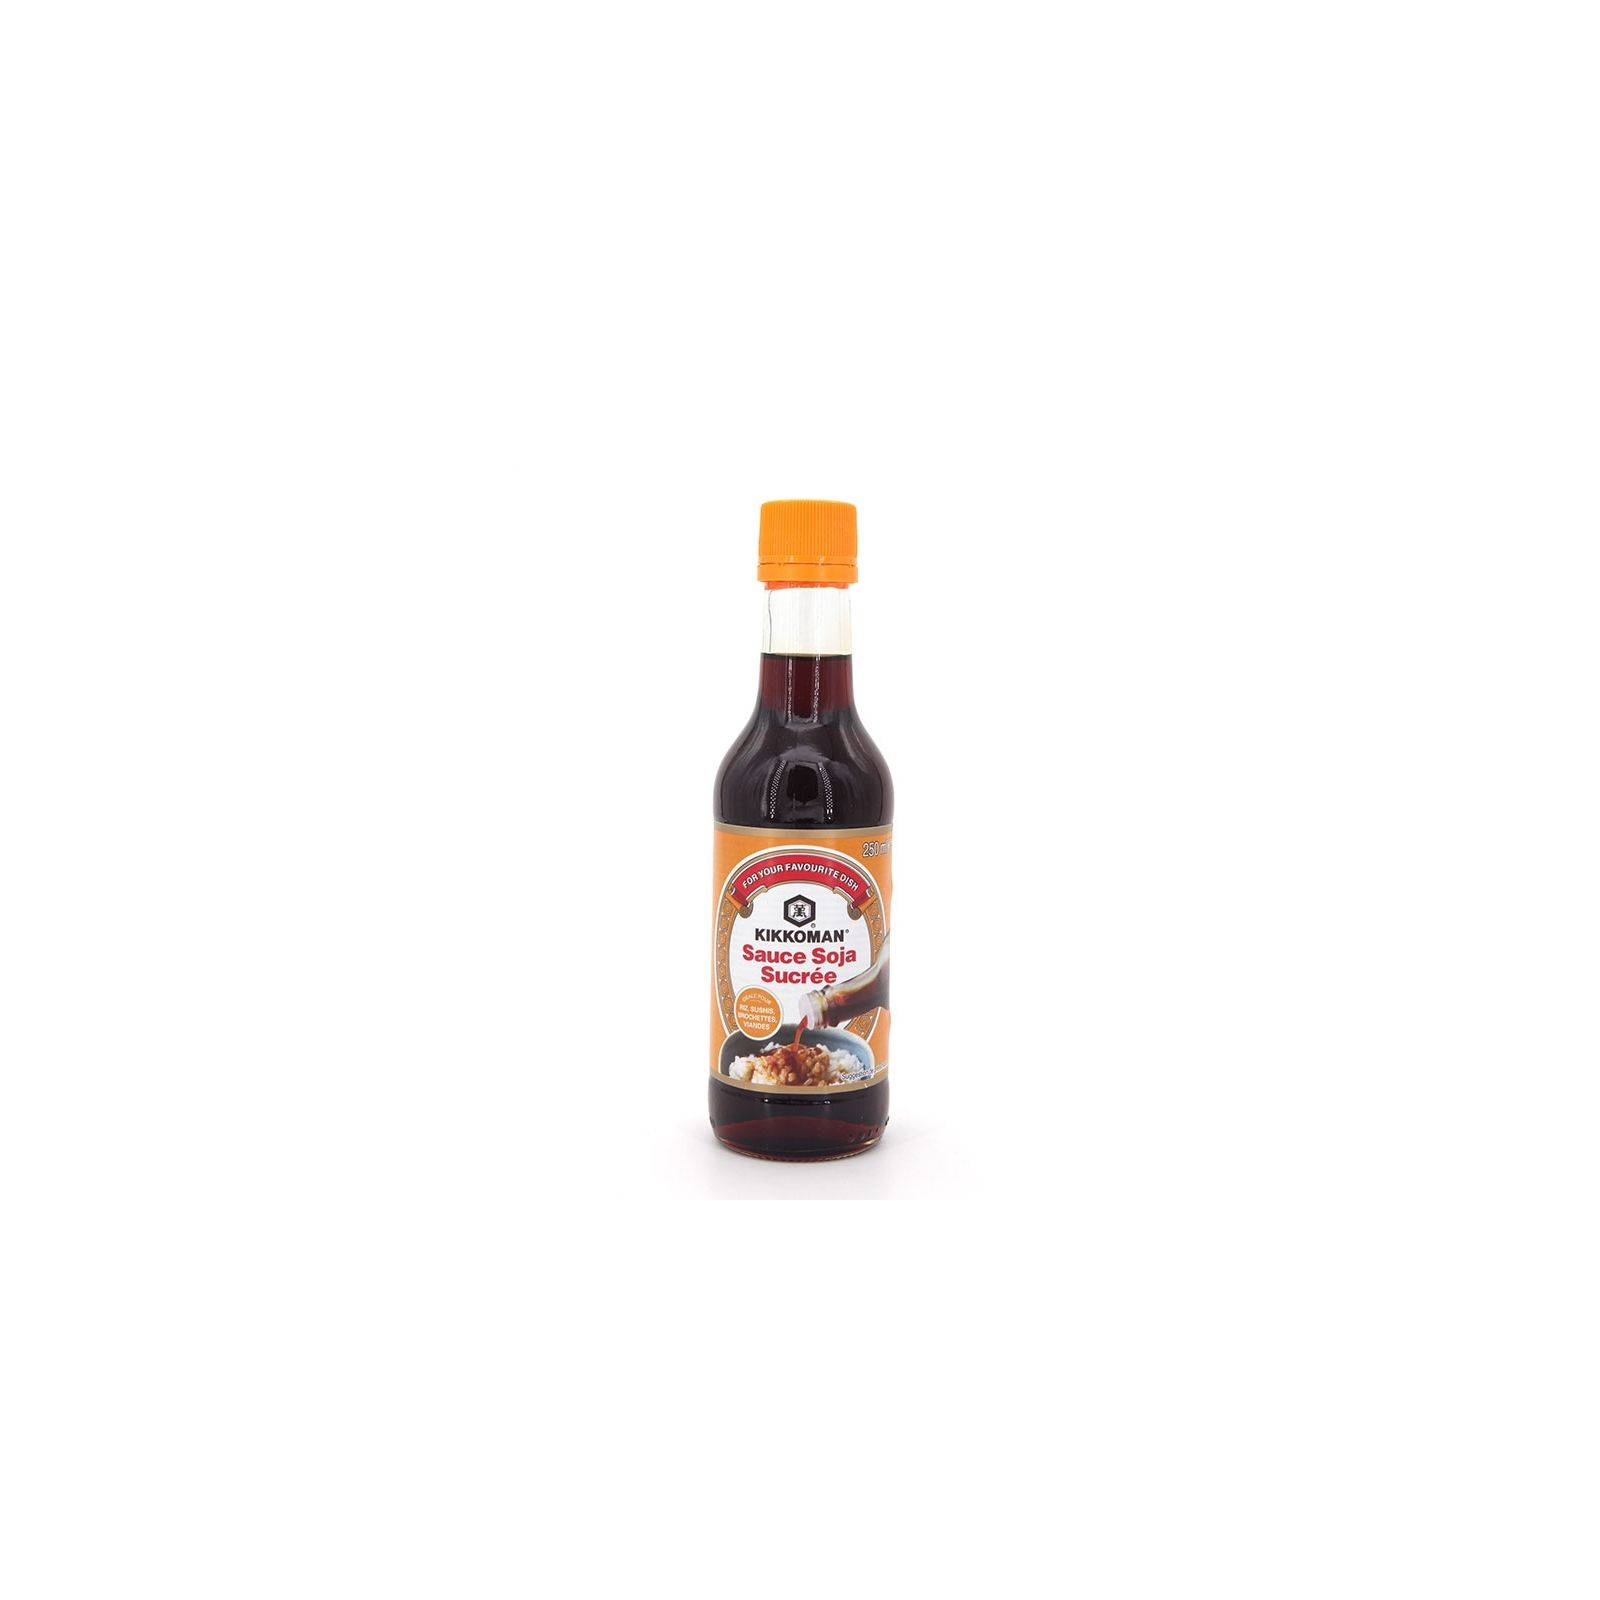 Asia Marché Sauce soja sucrée Kikkoman 250ml